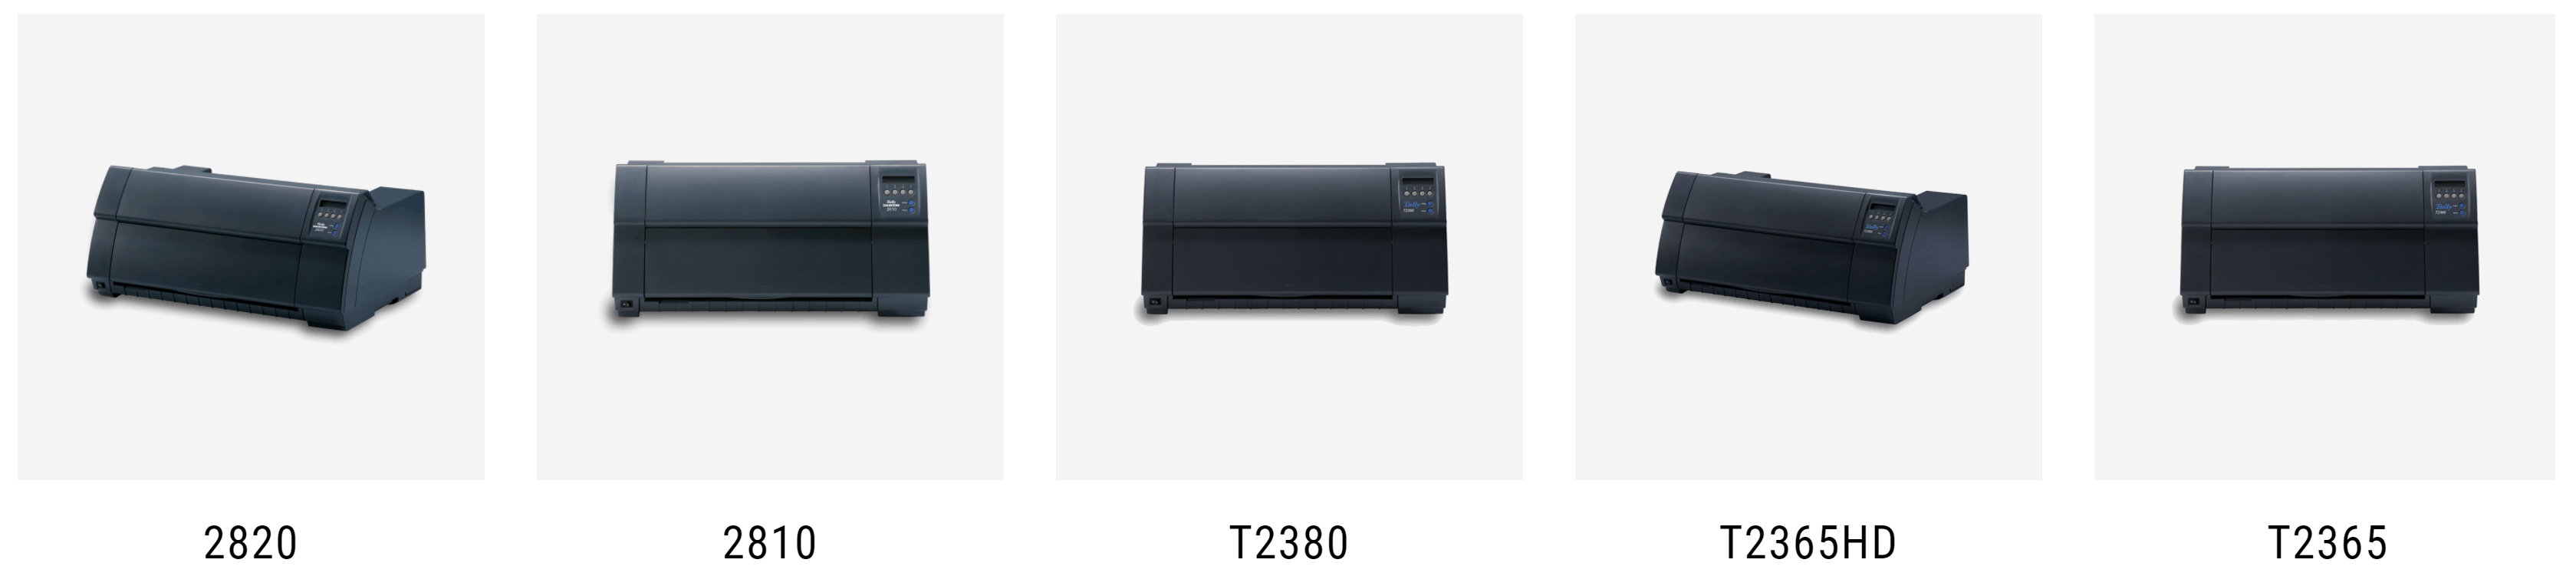 Tally DASCOM serial dot matrix printers